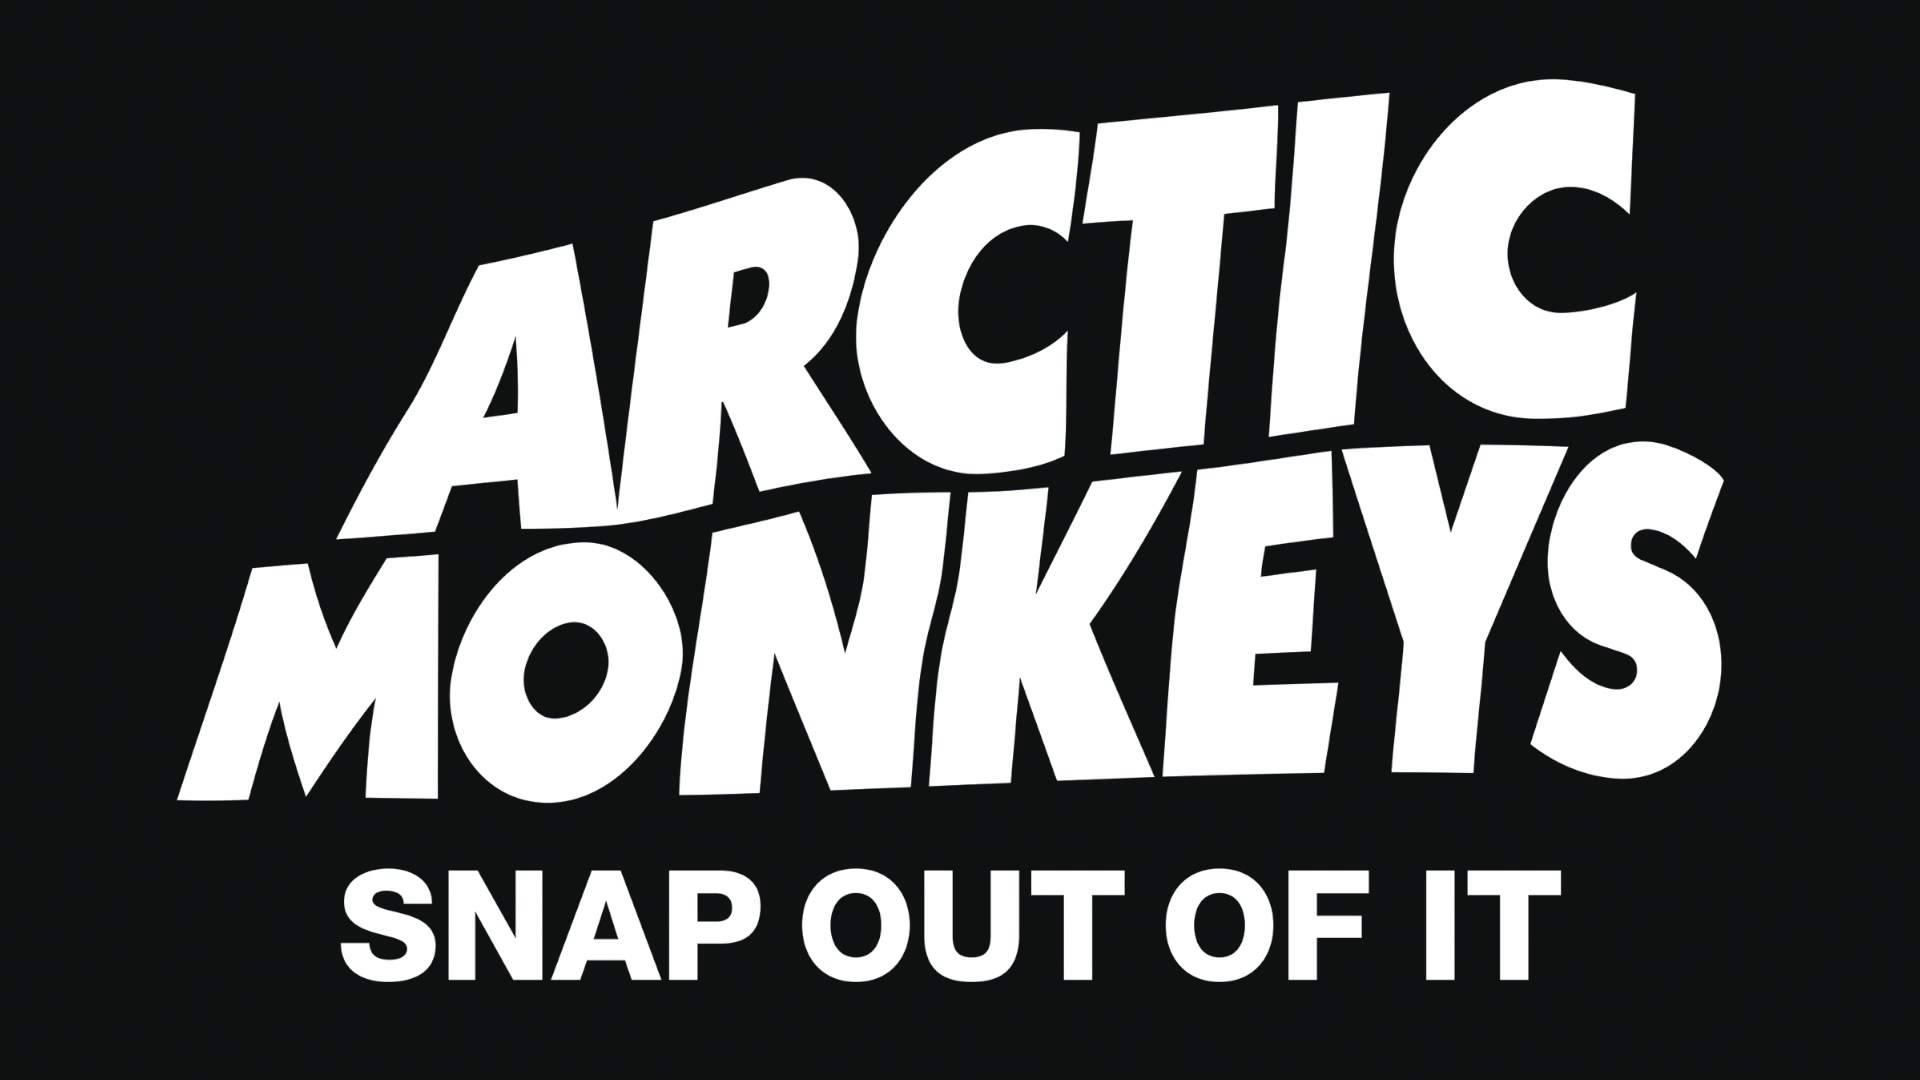 Arctic Monkeys Background